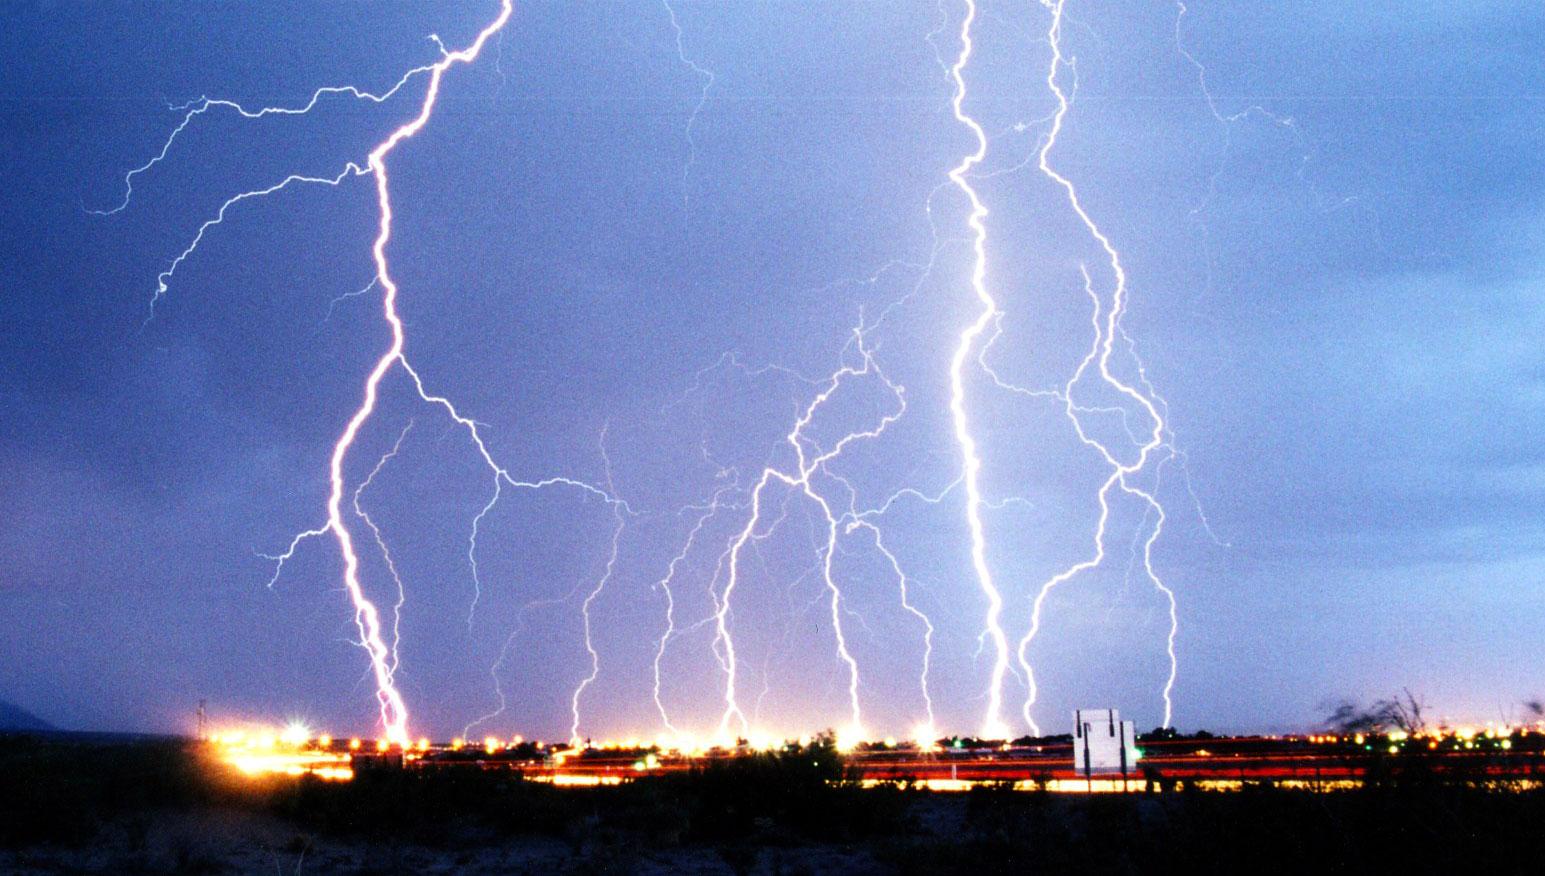 circuit_playground_lightning.jpg